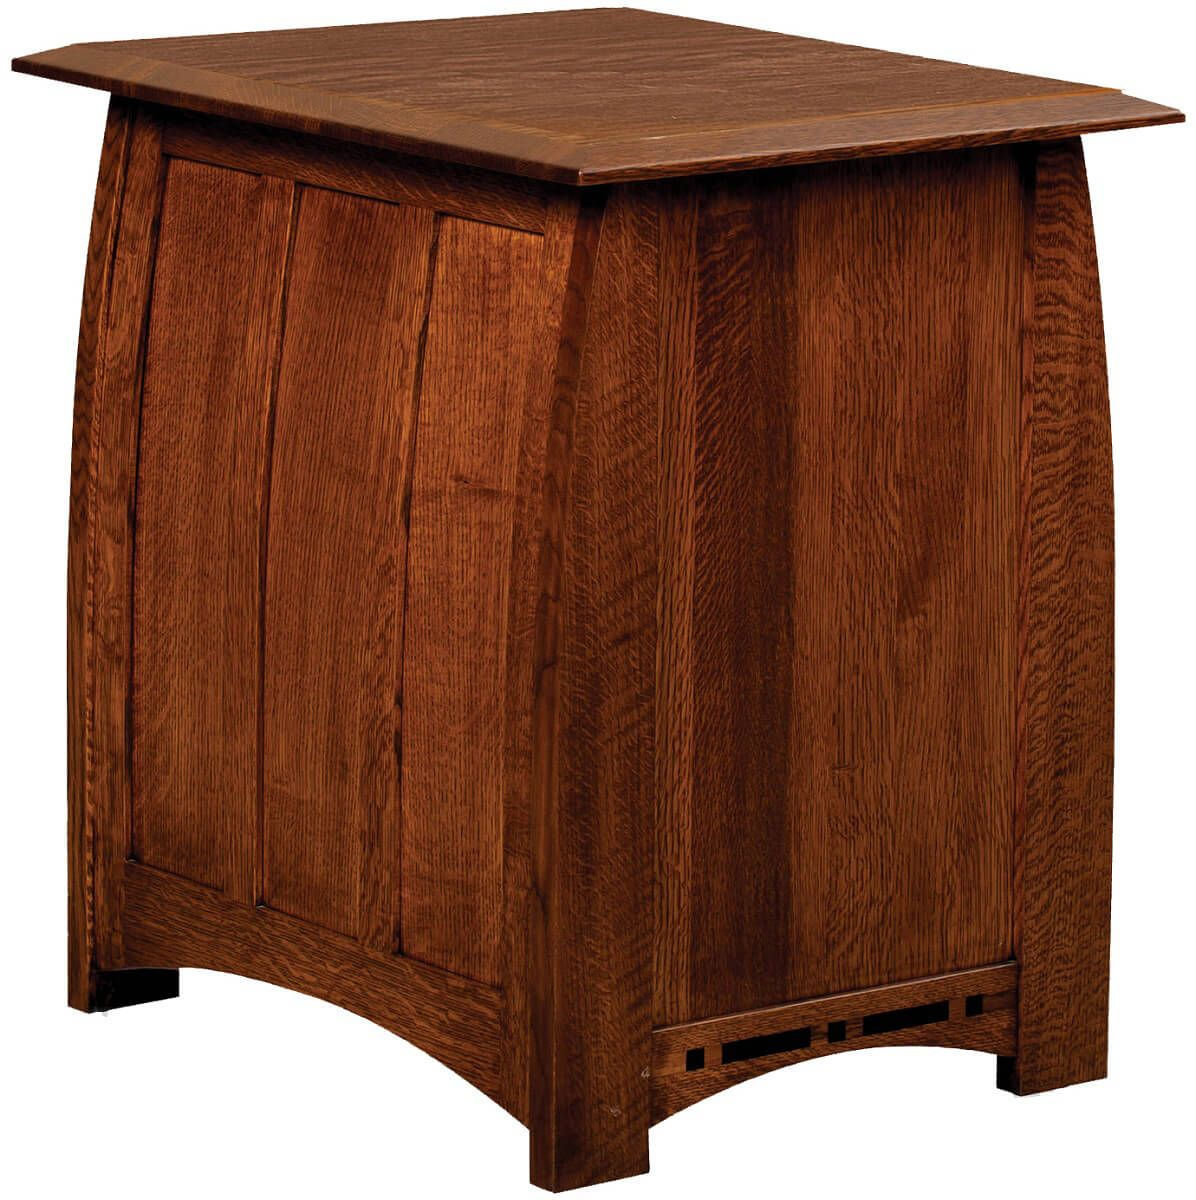 Coronado 2-Drawer File Cabinet - Back